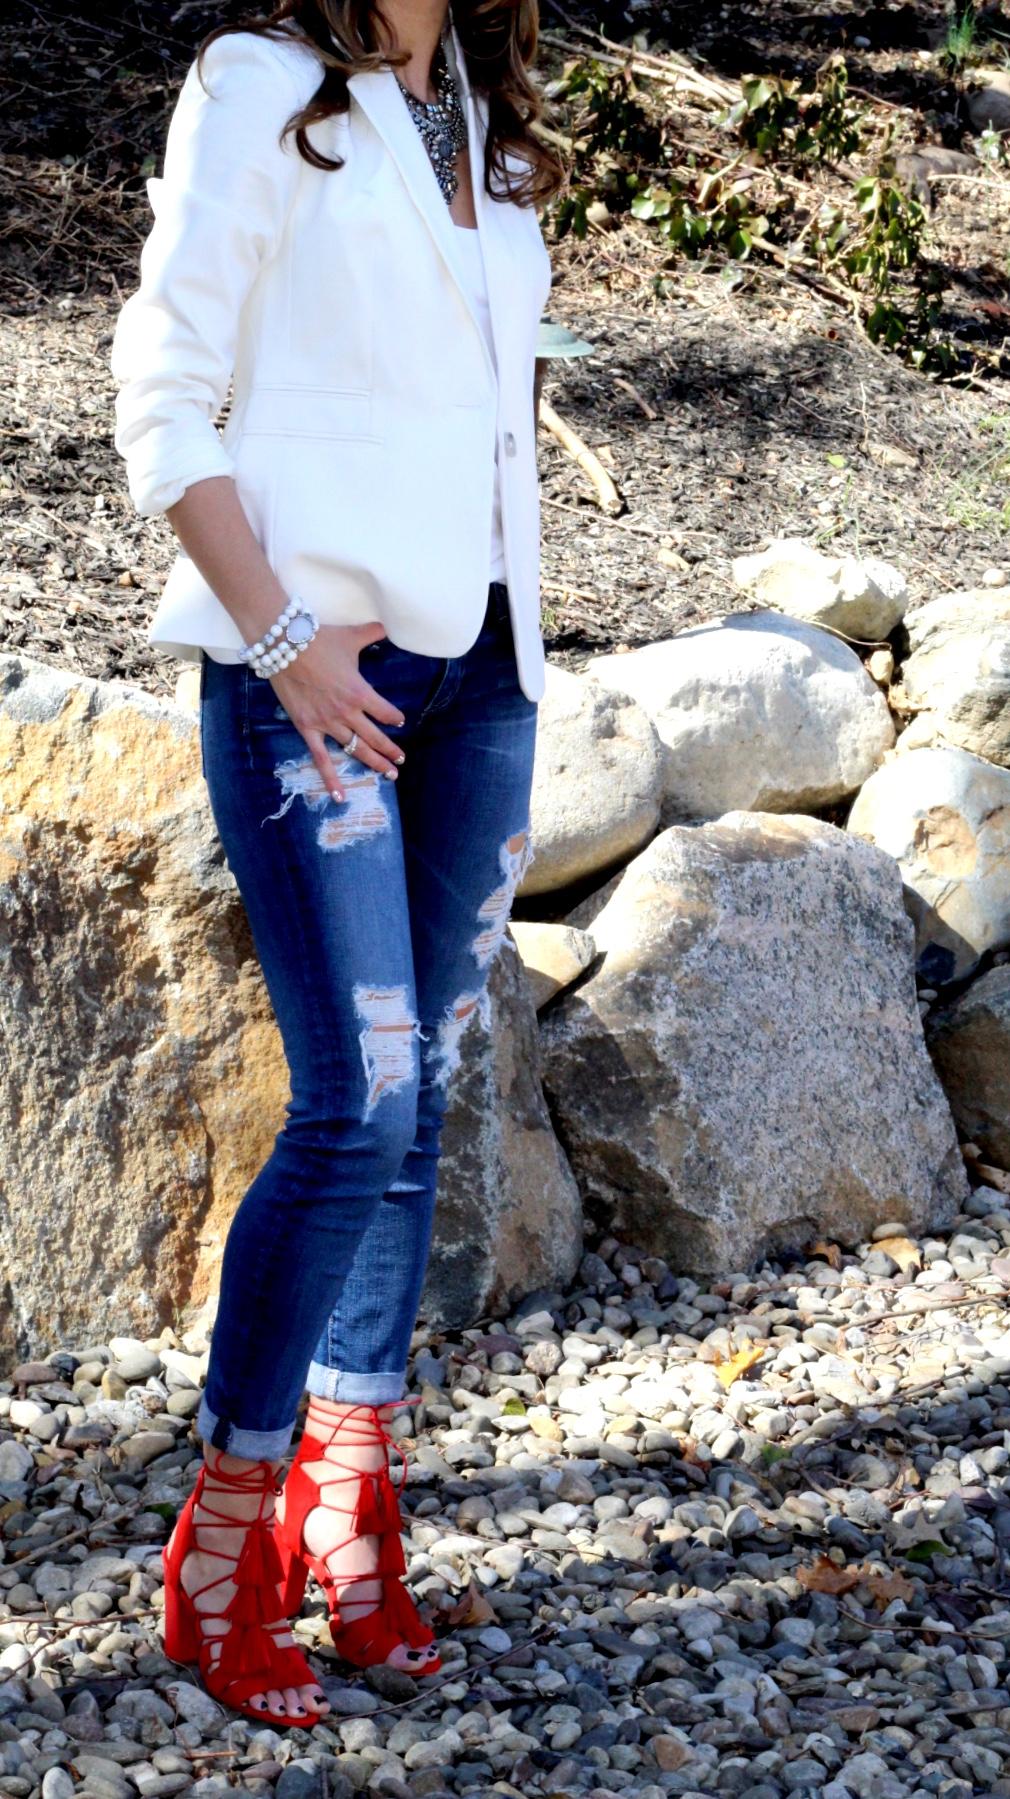 Jacket -  Express Jeans -  AG jeans Shoes -  Loeffler Randall   Necklace -  Dylan Lex  Bracelet -  Ladybug Couture